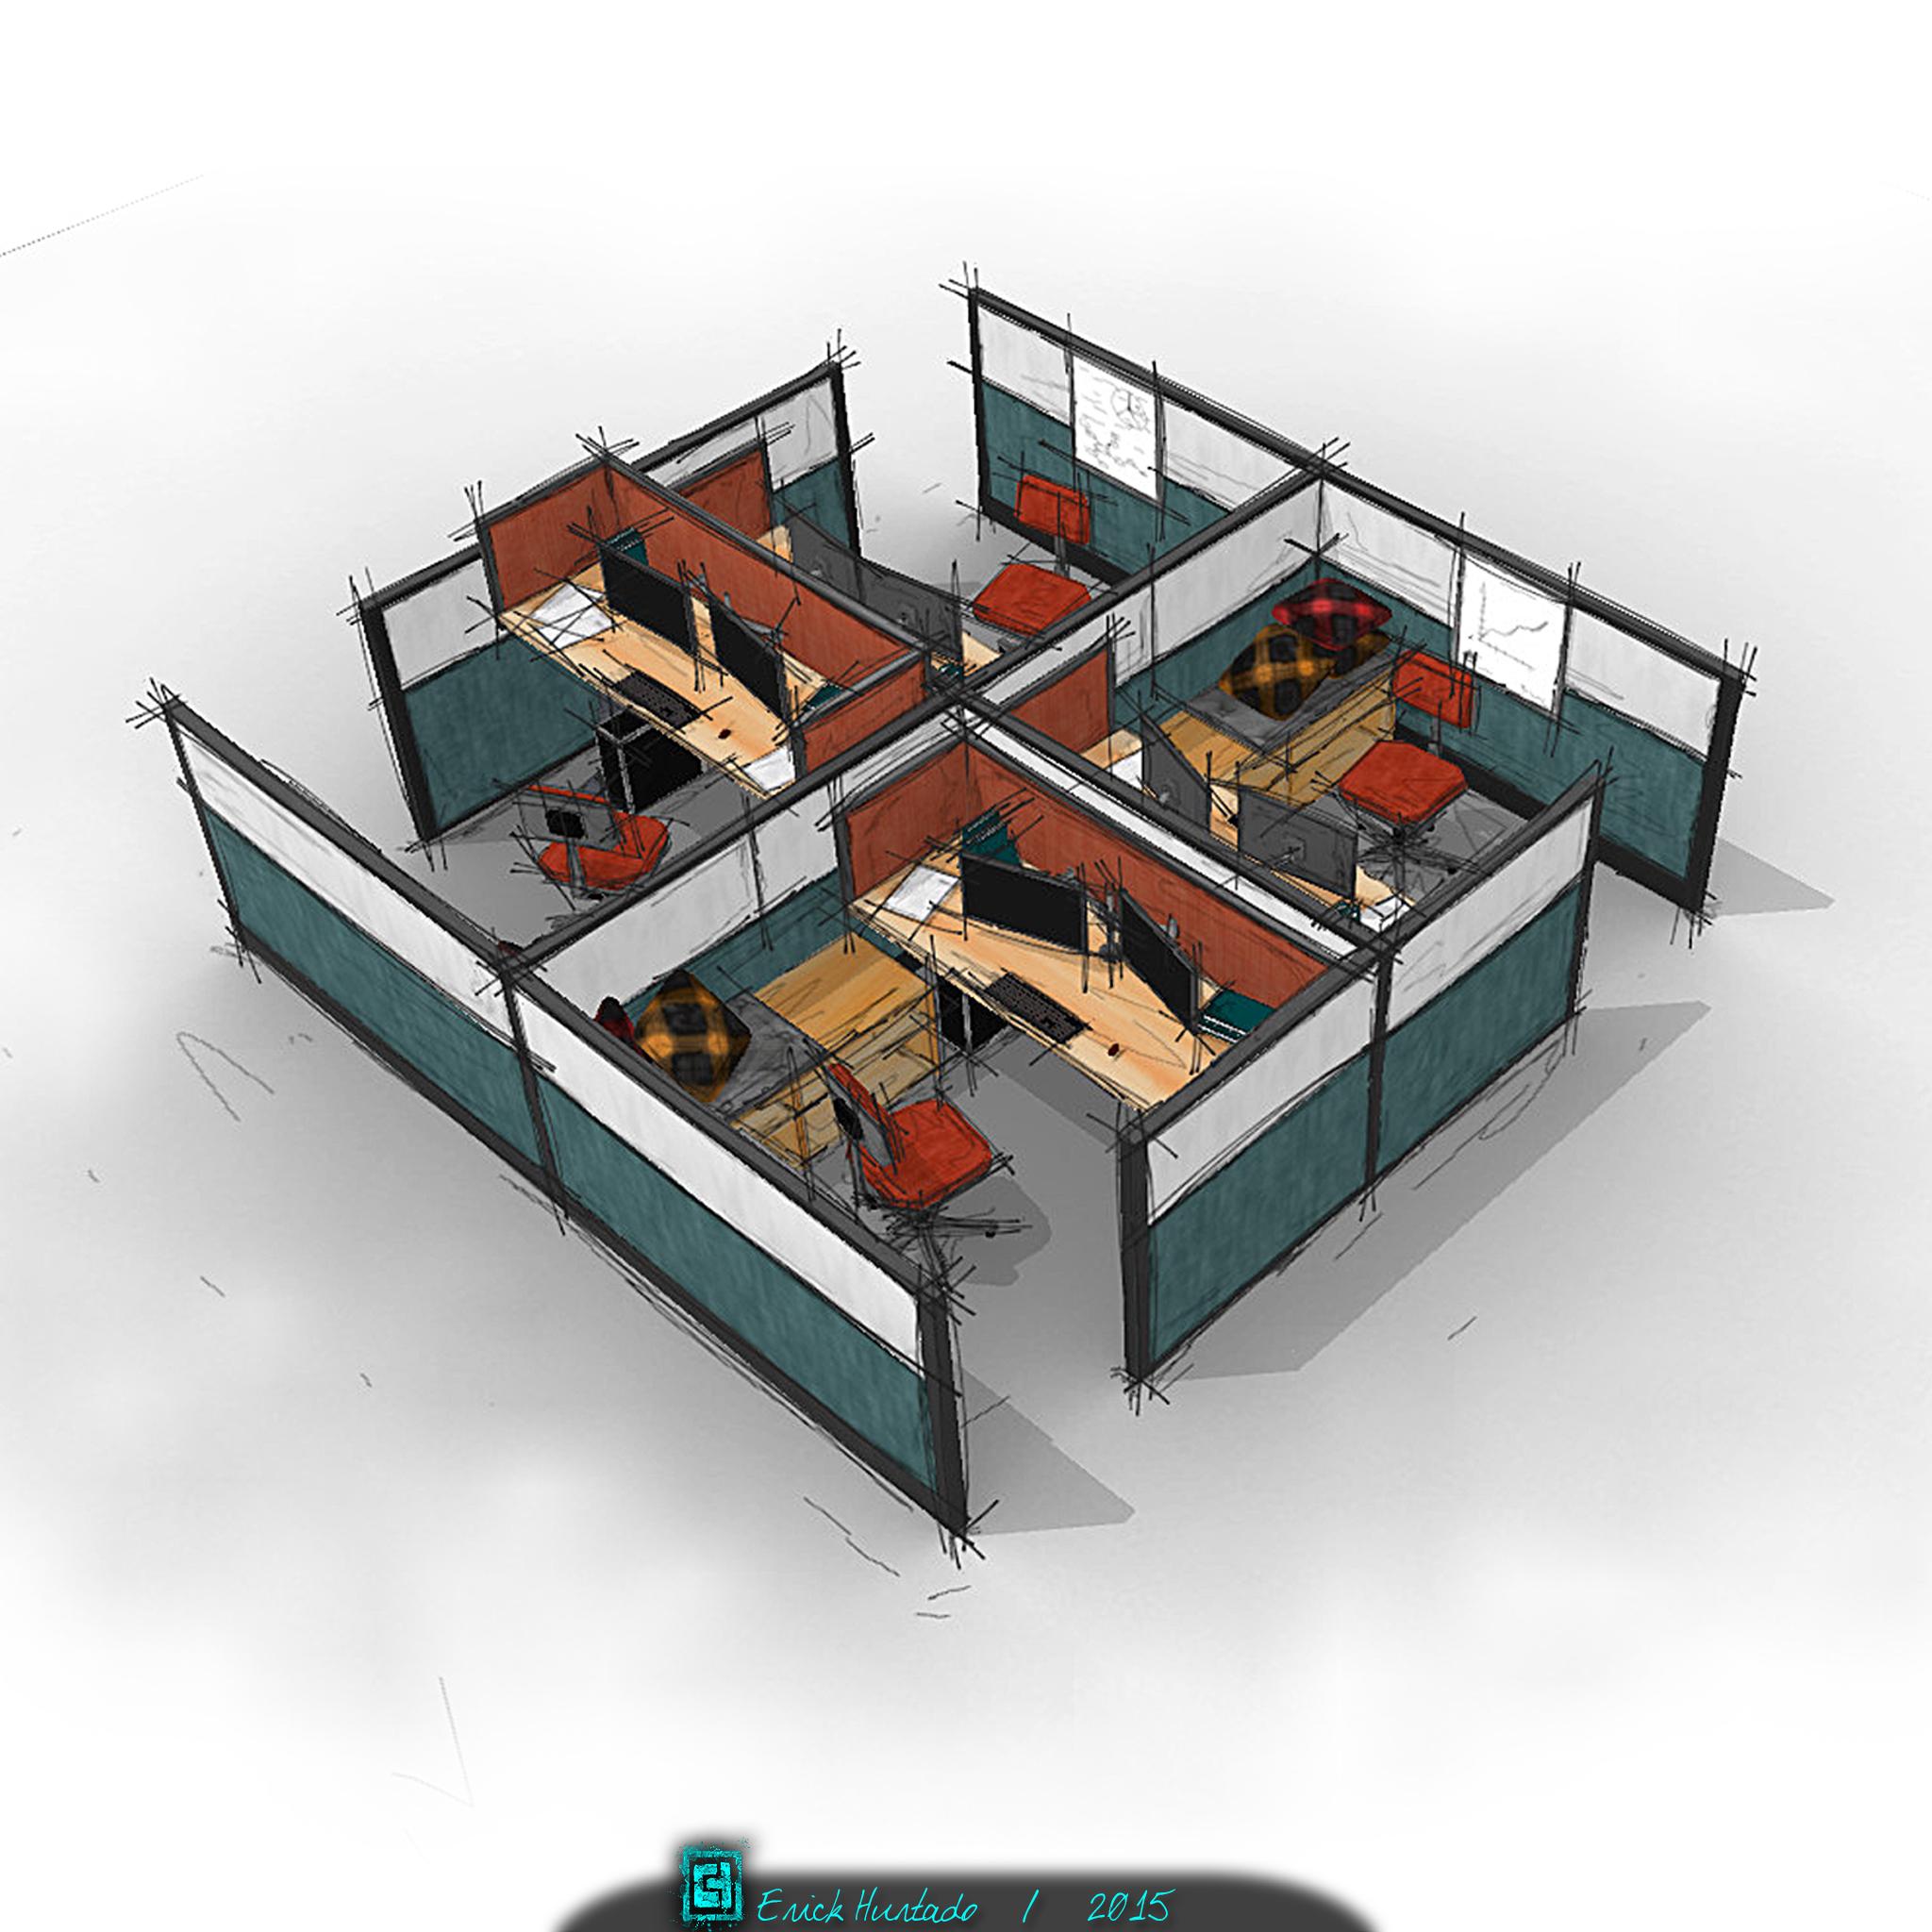 ewHurtado_OfficeSpace_01.jpg